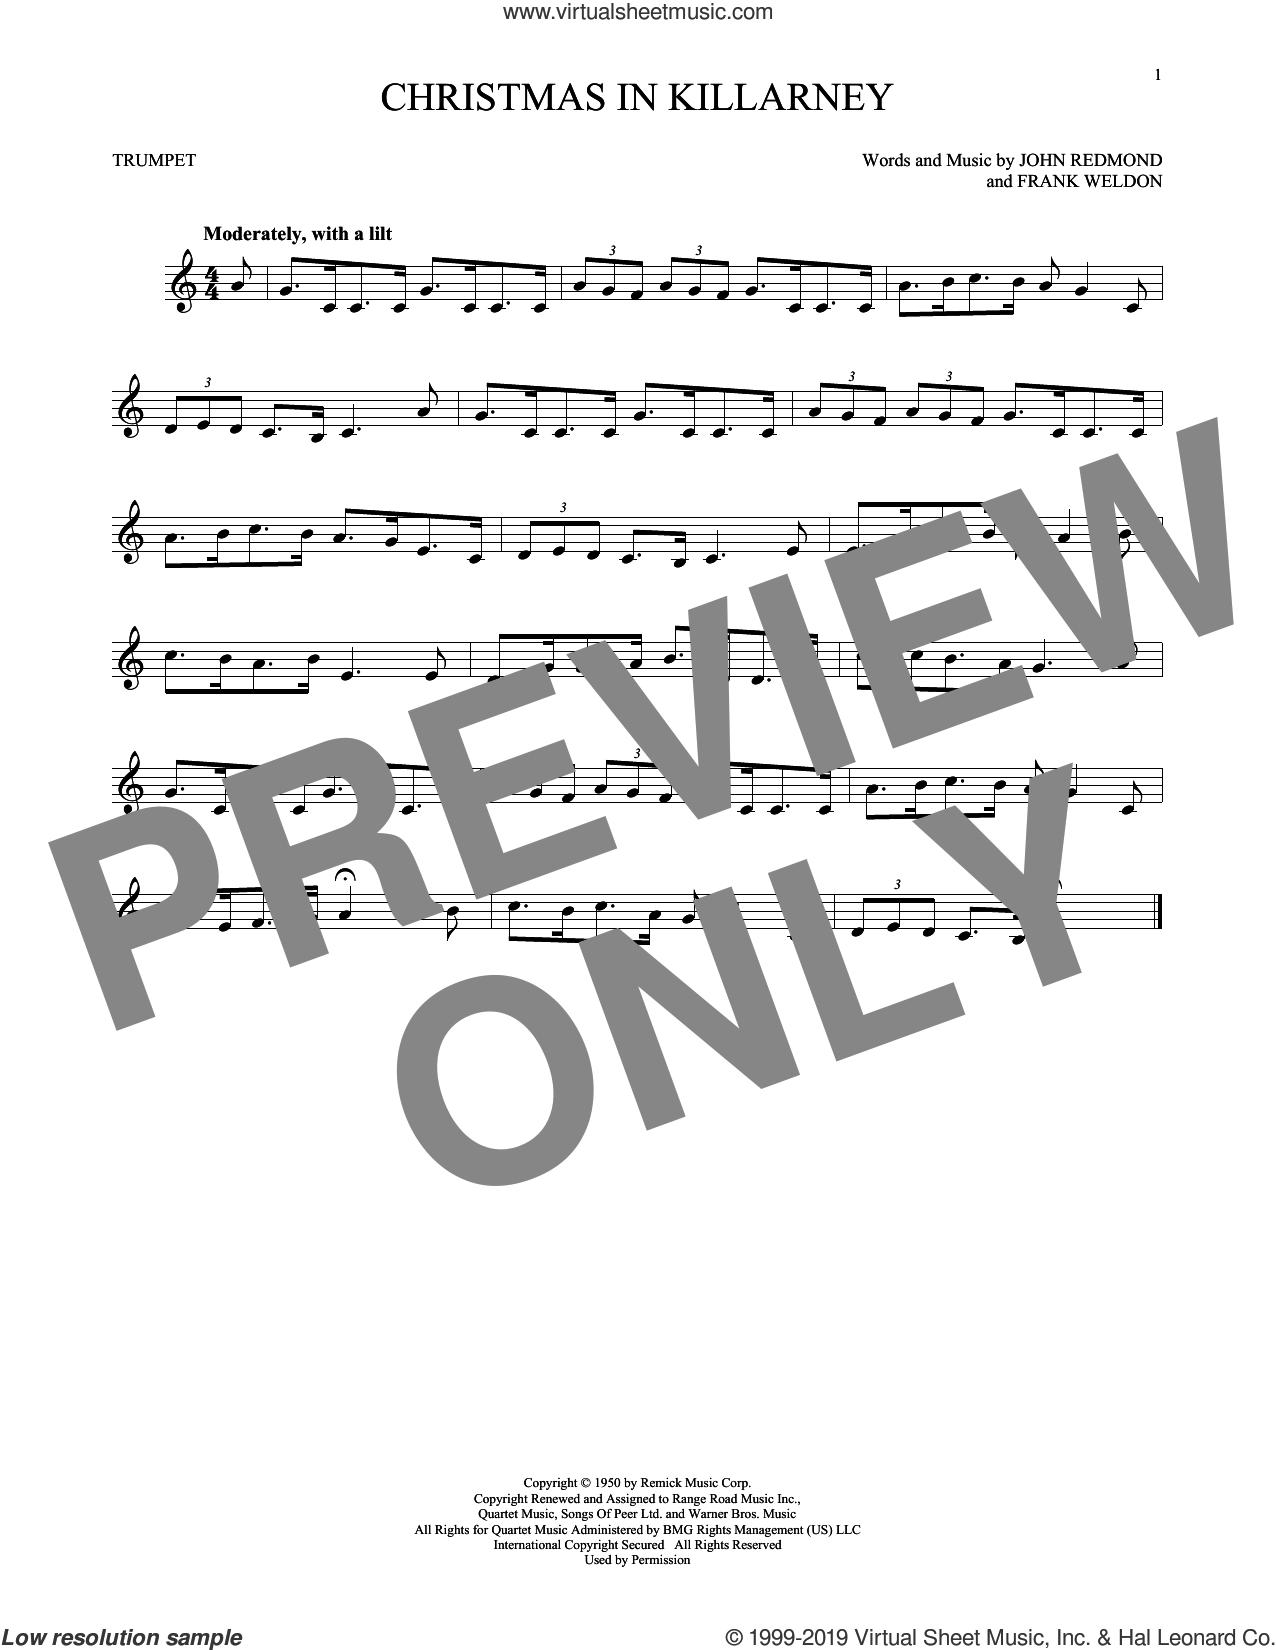 Christmas In Killarney sheet music for trumpet solo by John Redmond, Frank Weldon and John Redmond & Frank Weldon, intermediate skill level